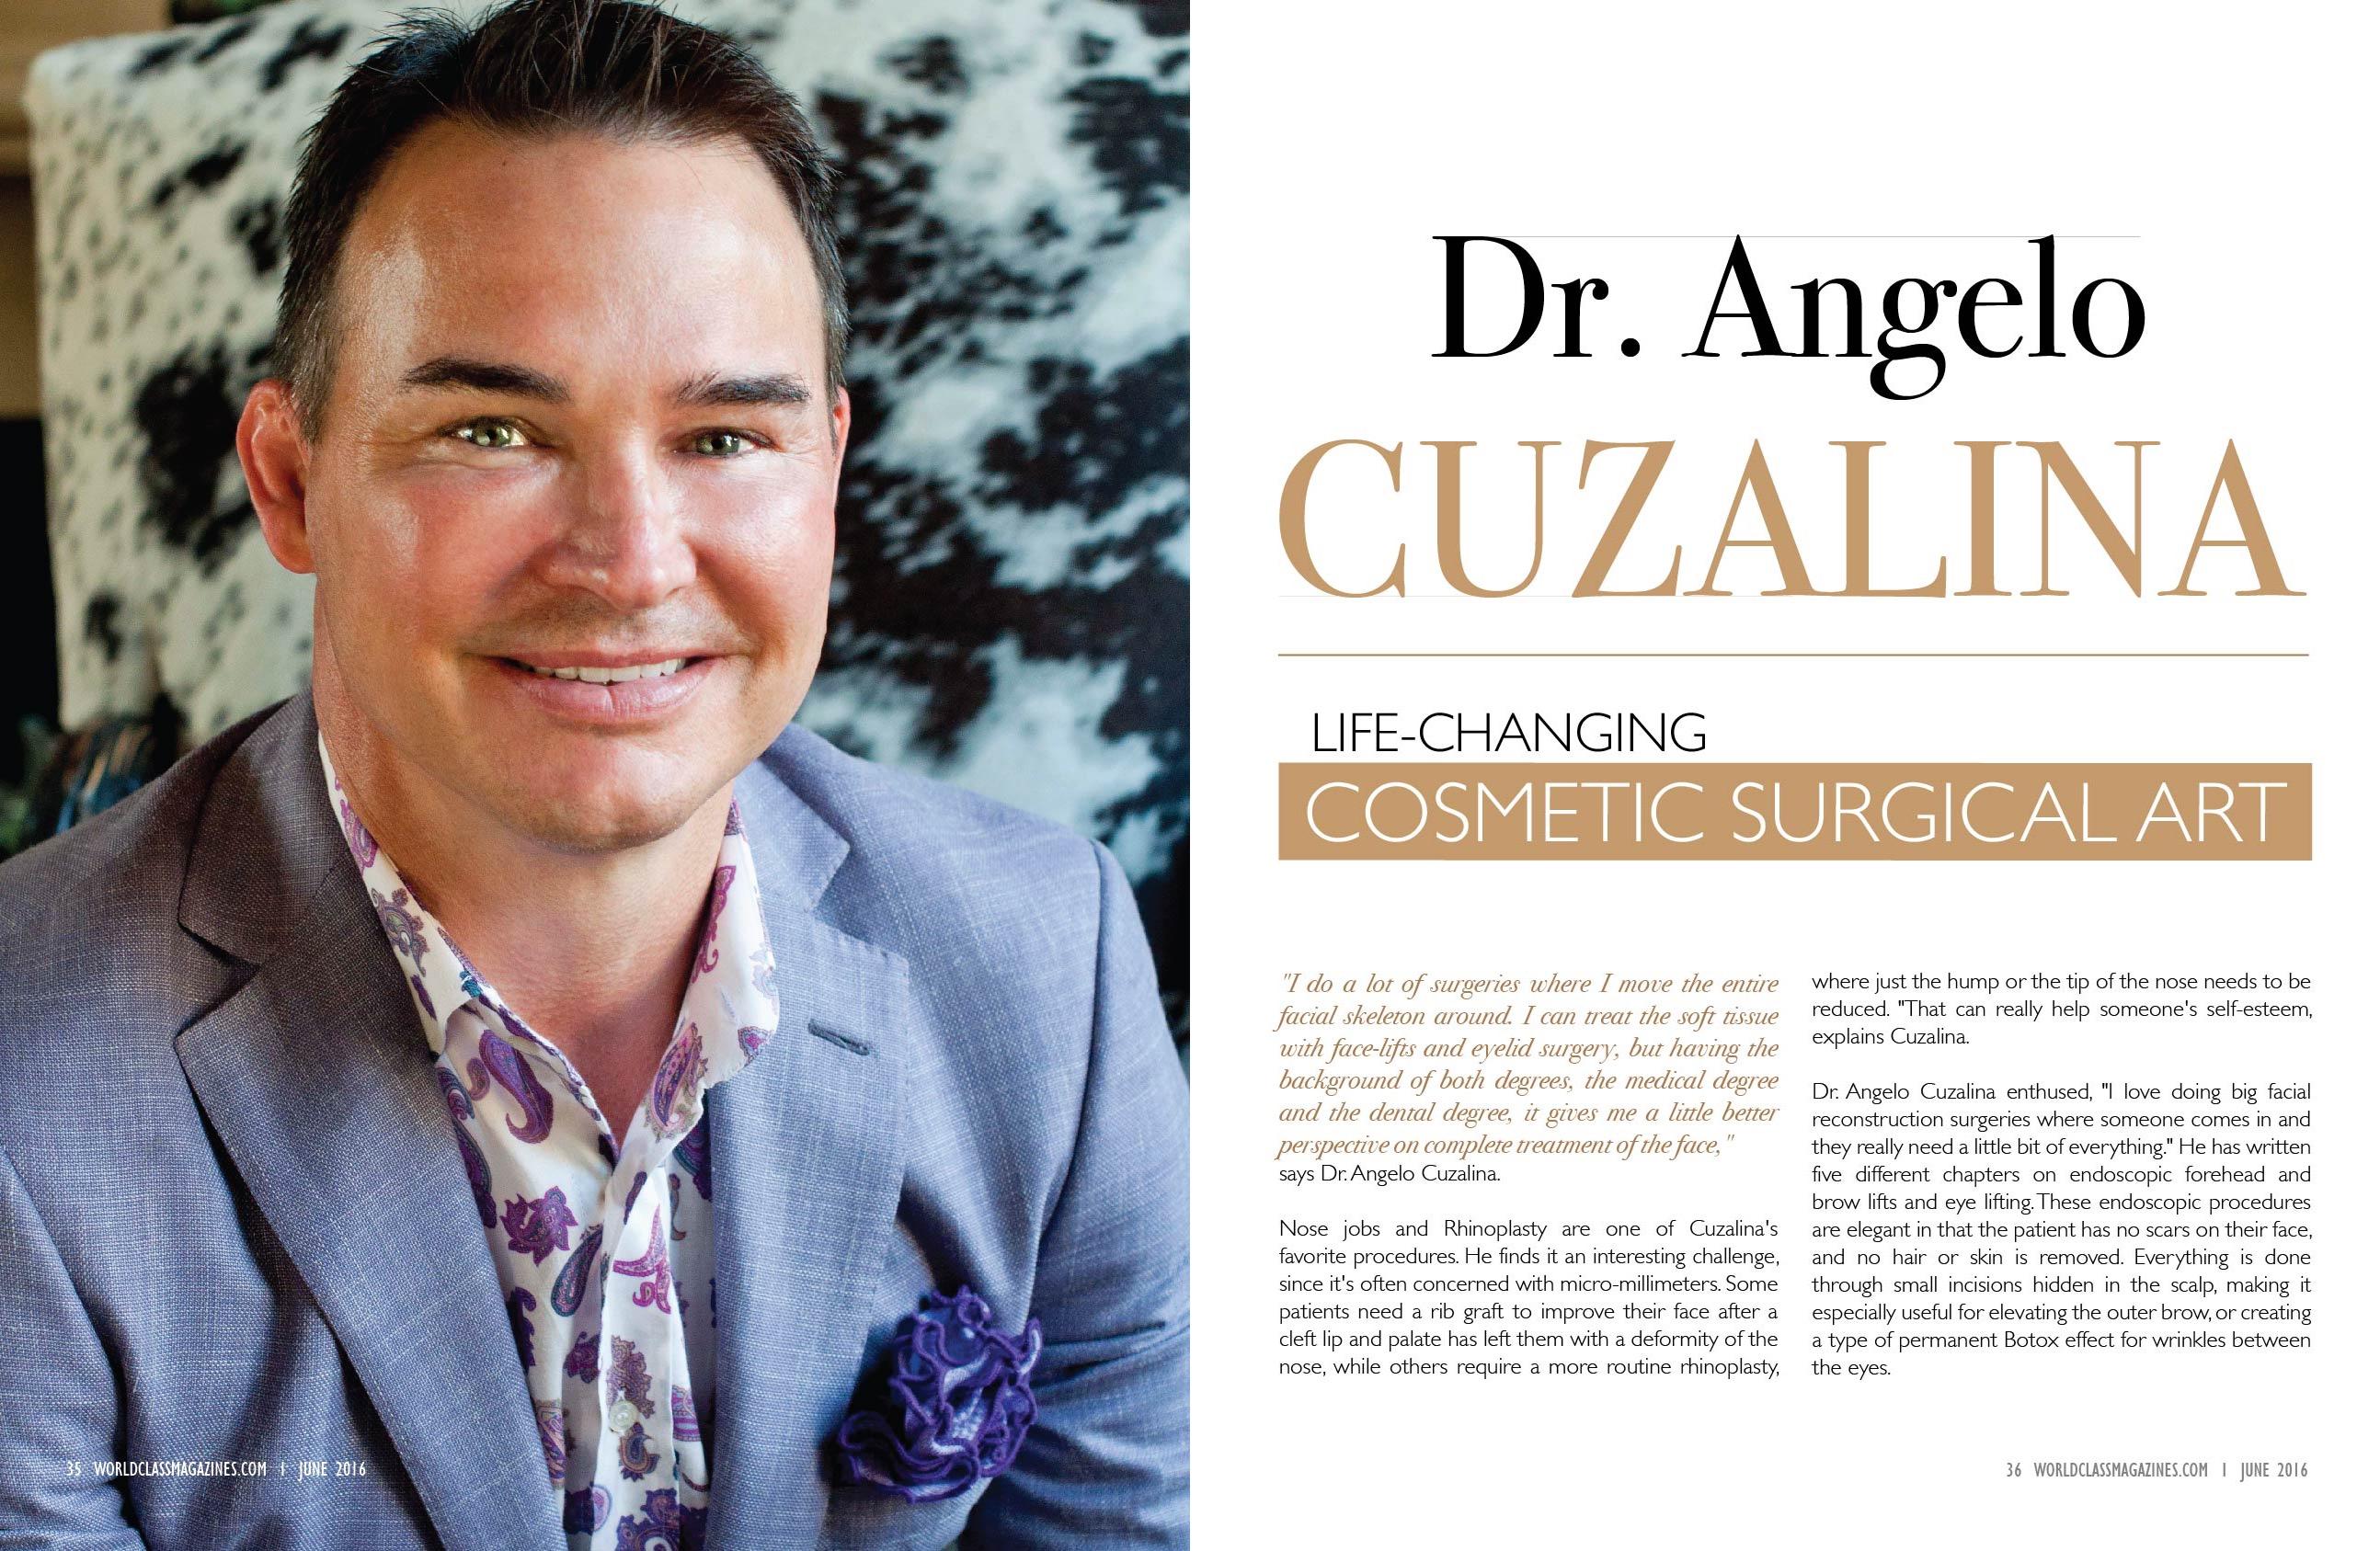 DR Angelo Cuzalina